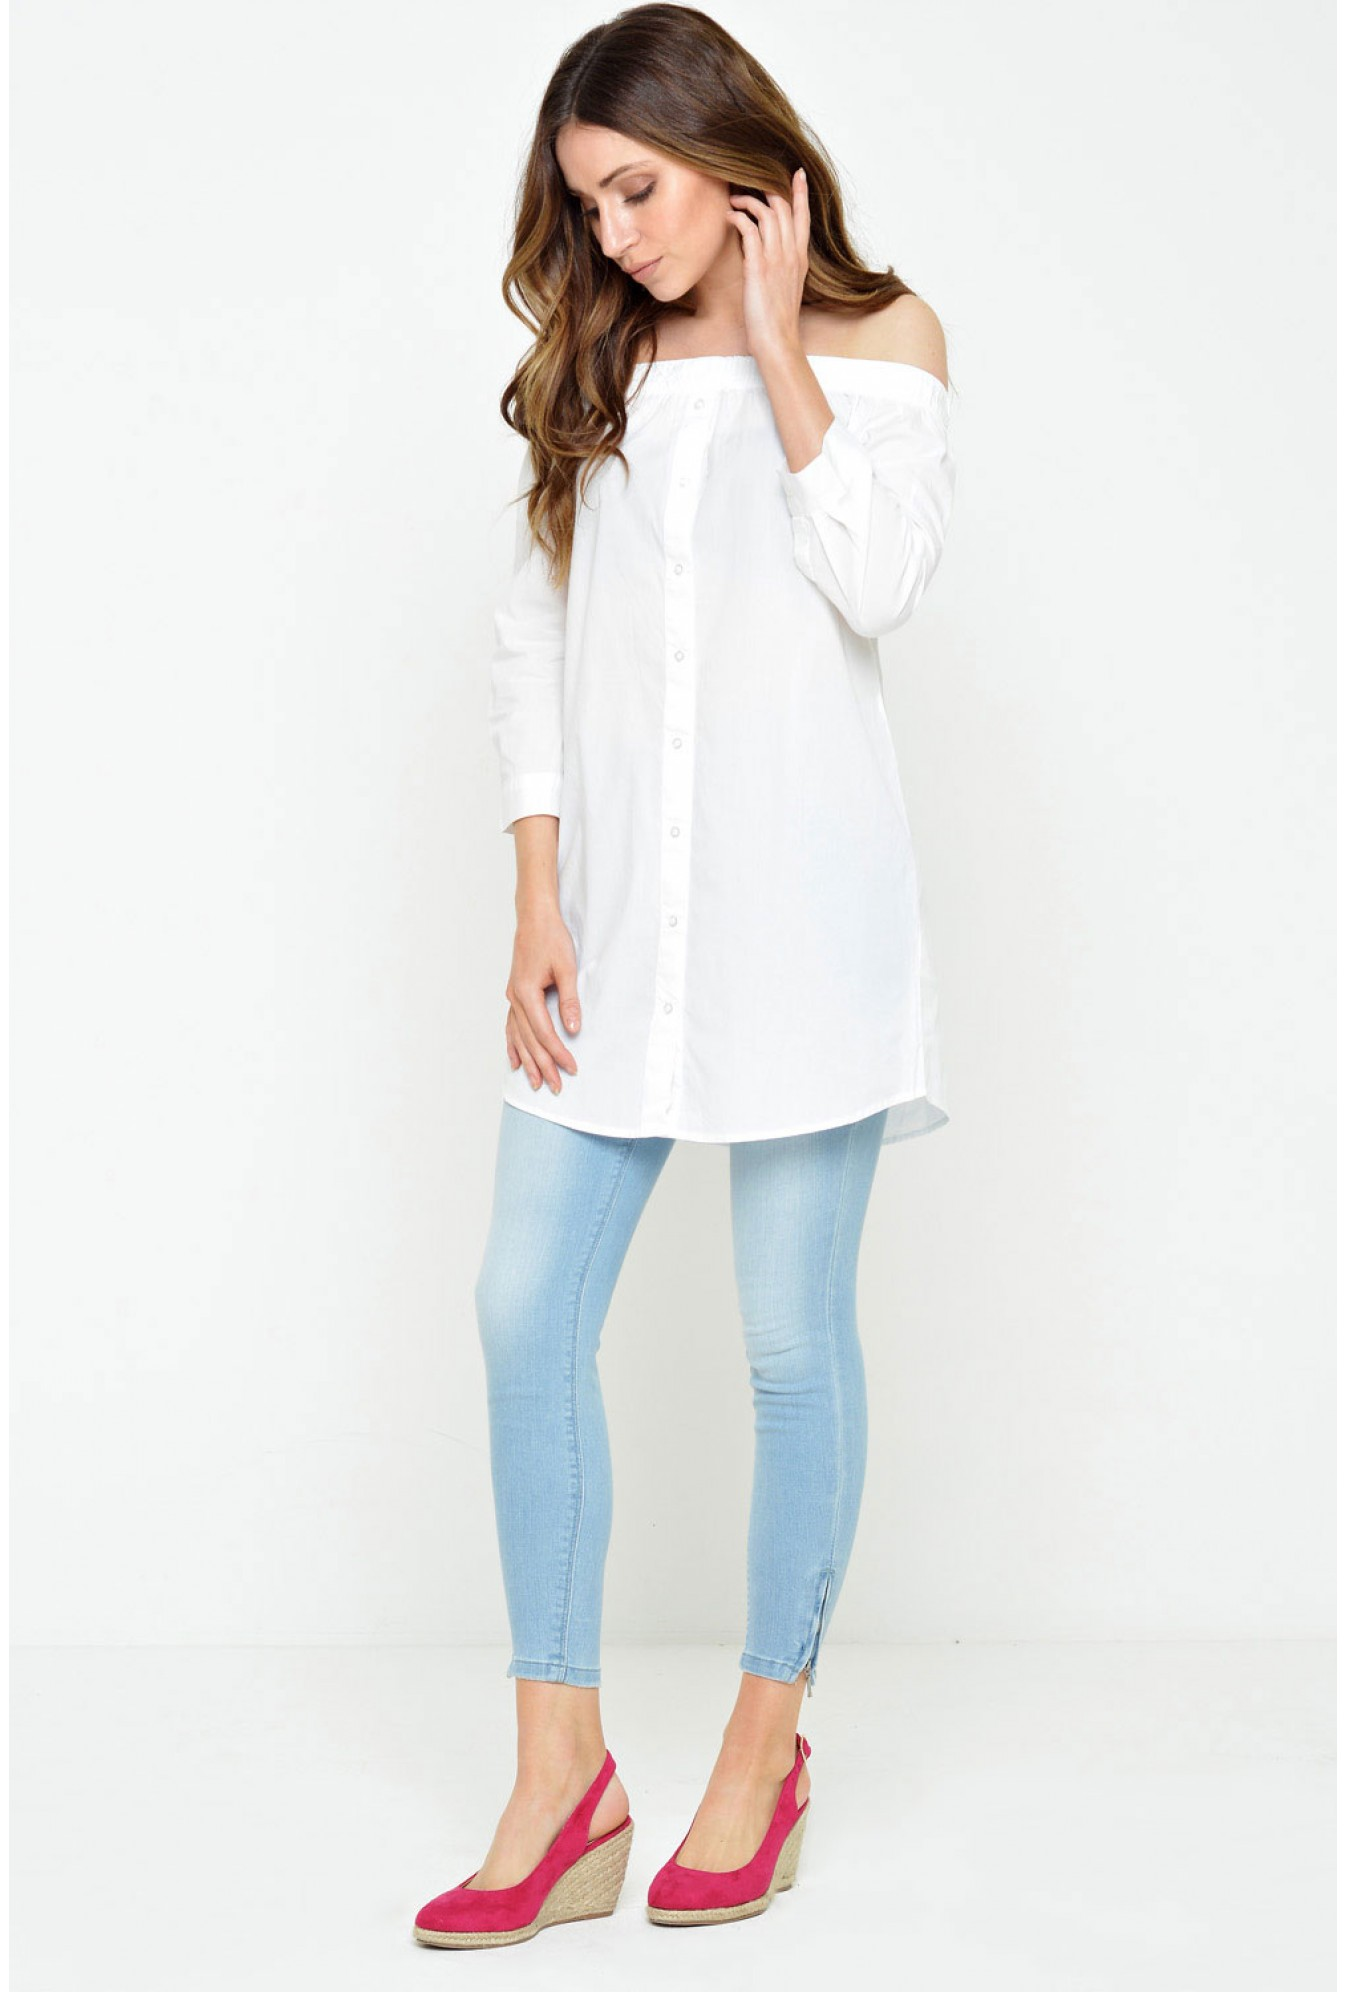 ceea90553efc Jacqueline De Yong Litzy Tiffany 3 4 Off Shoulder Tunic in White ...